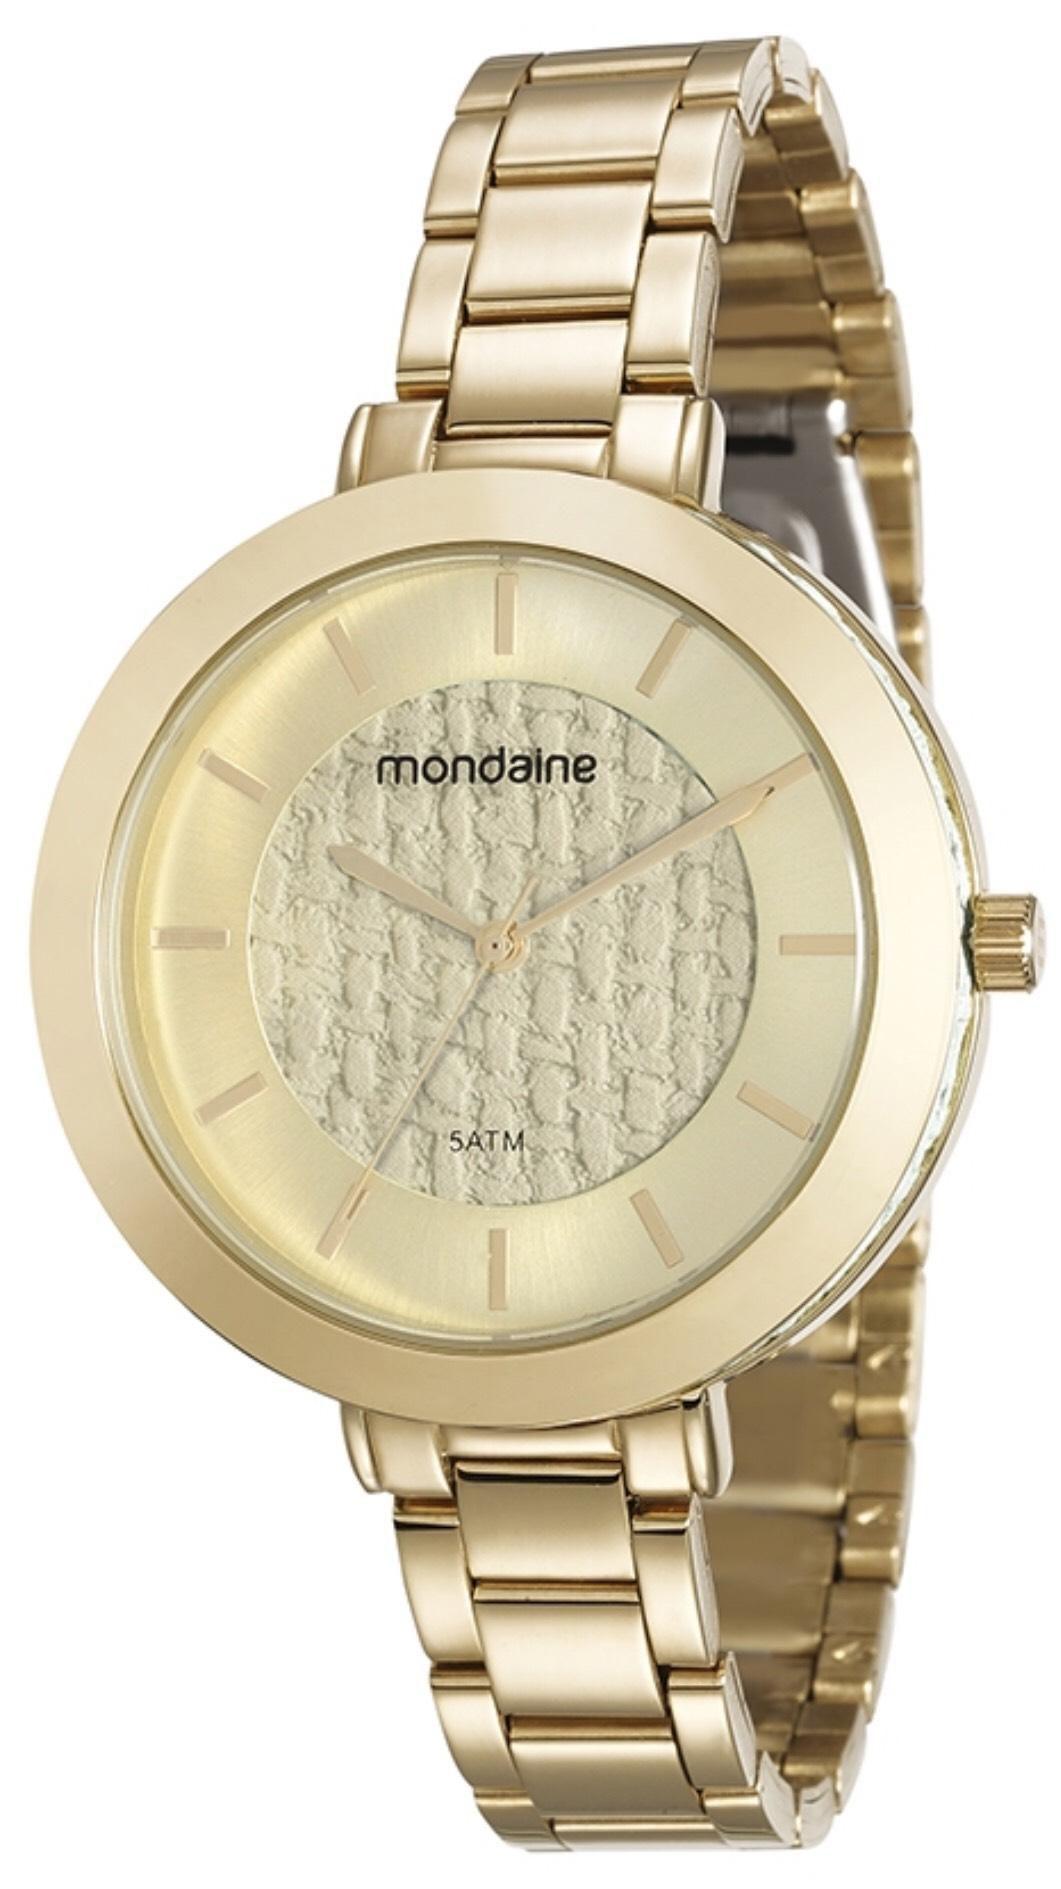 Relógio Feminino Mondaine 99172LPMVDE1 42mm Aço Dourado